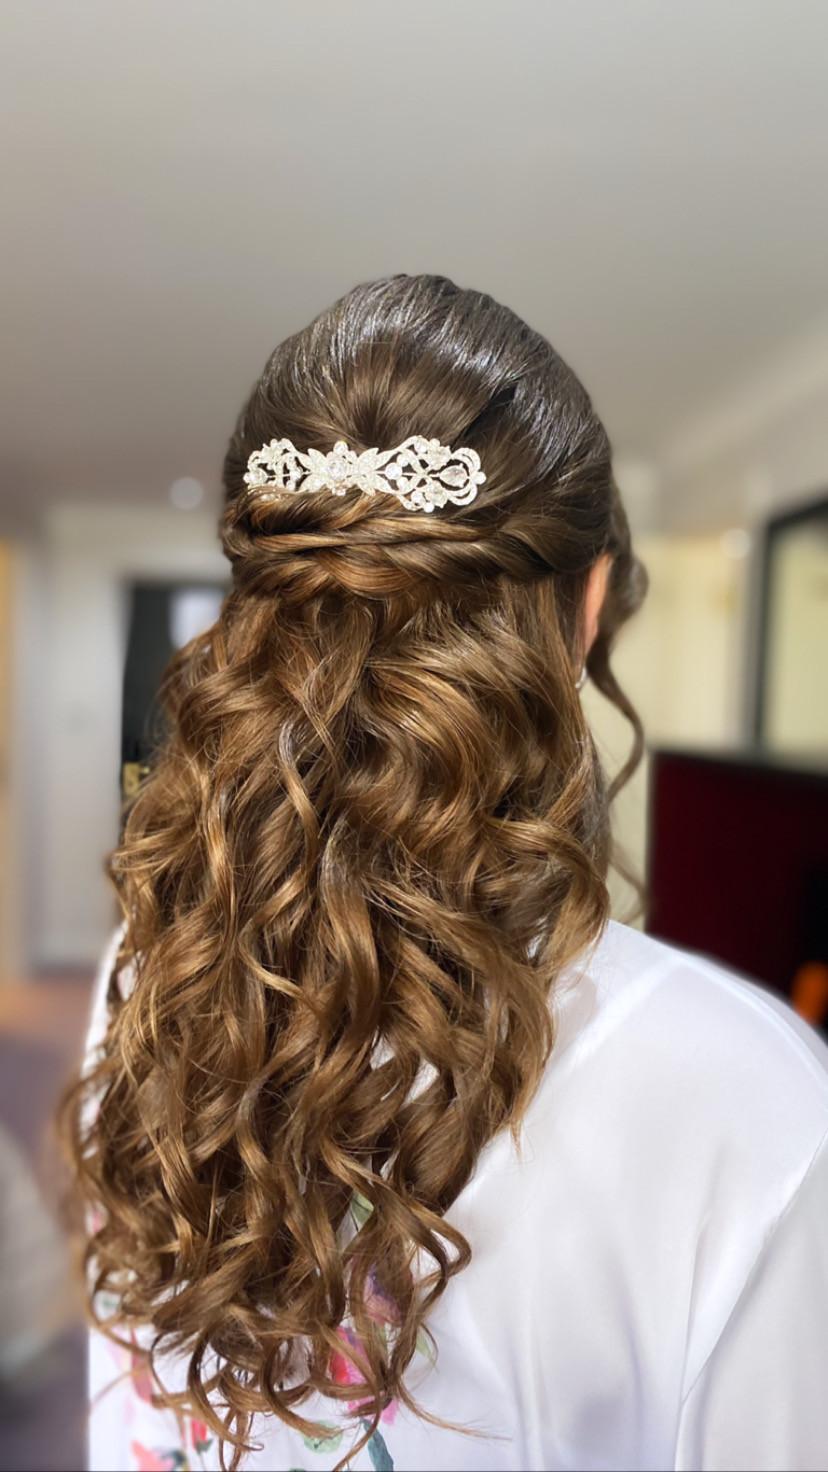 - Make Me Bridal Artist: The Hairbook. #bohemian #classic #glamorous #boho #halfuphair #curls #weddingmorning #bridalhair